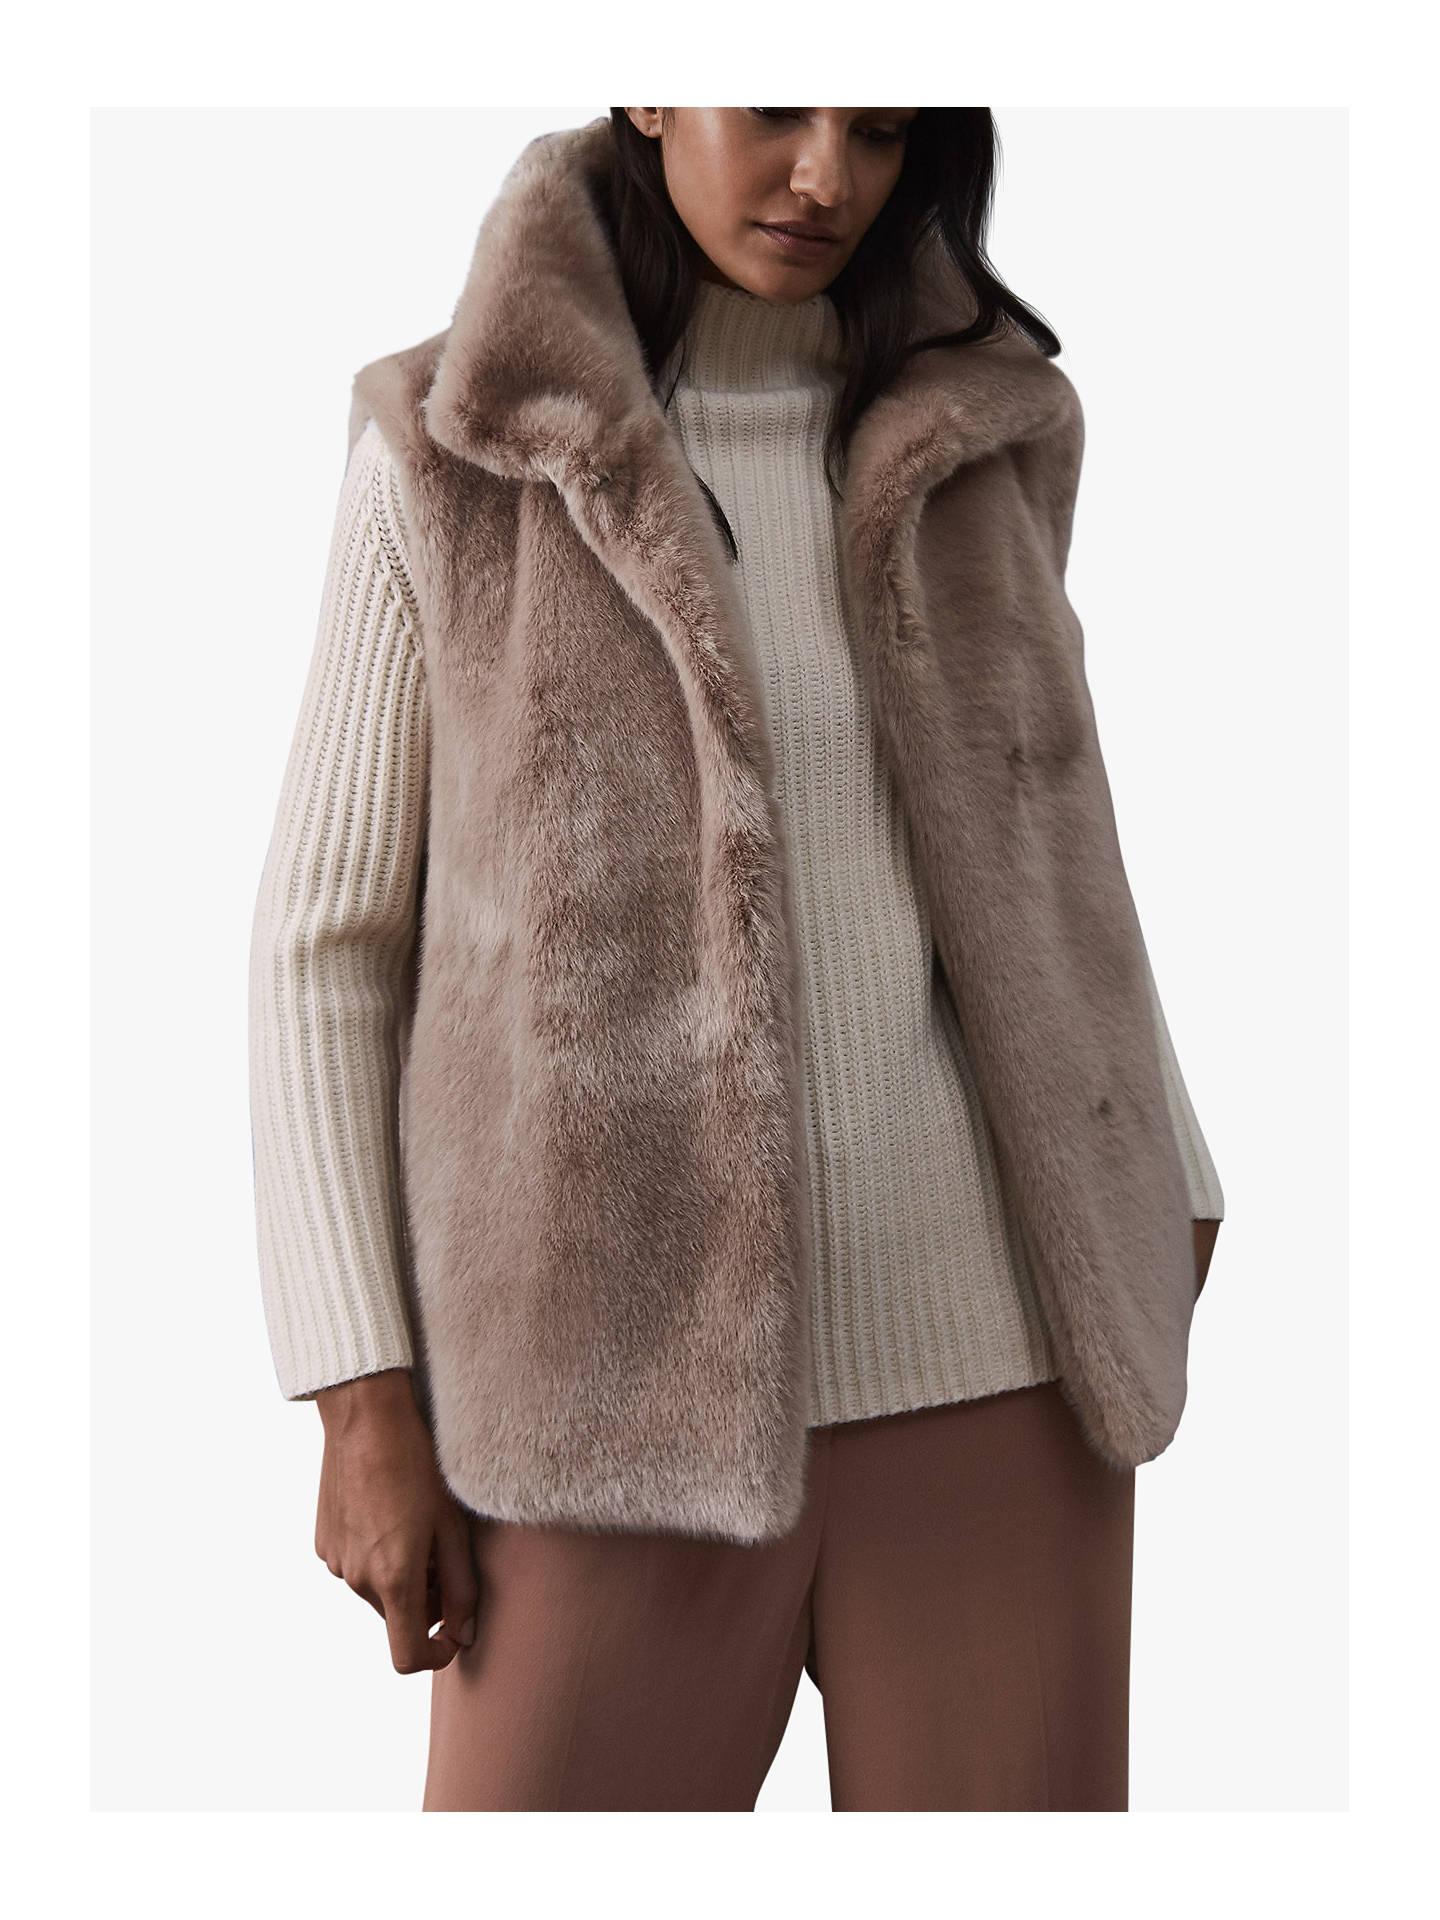 BuyReiss Fay Faux Fur Gilet 7300828b29218